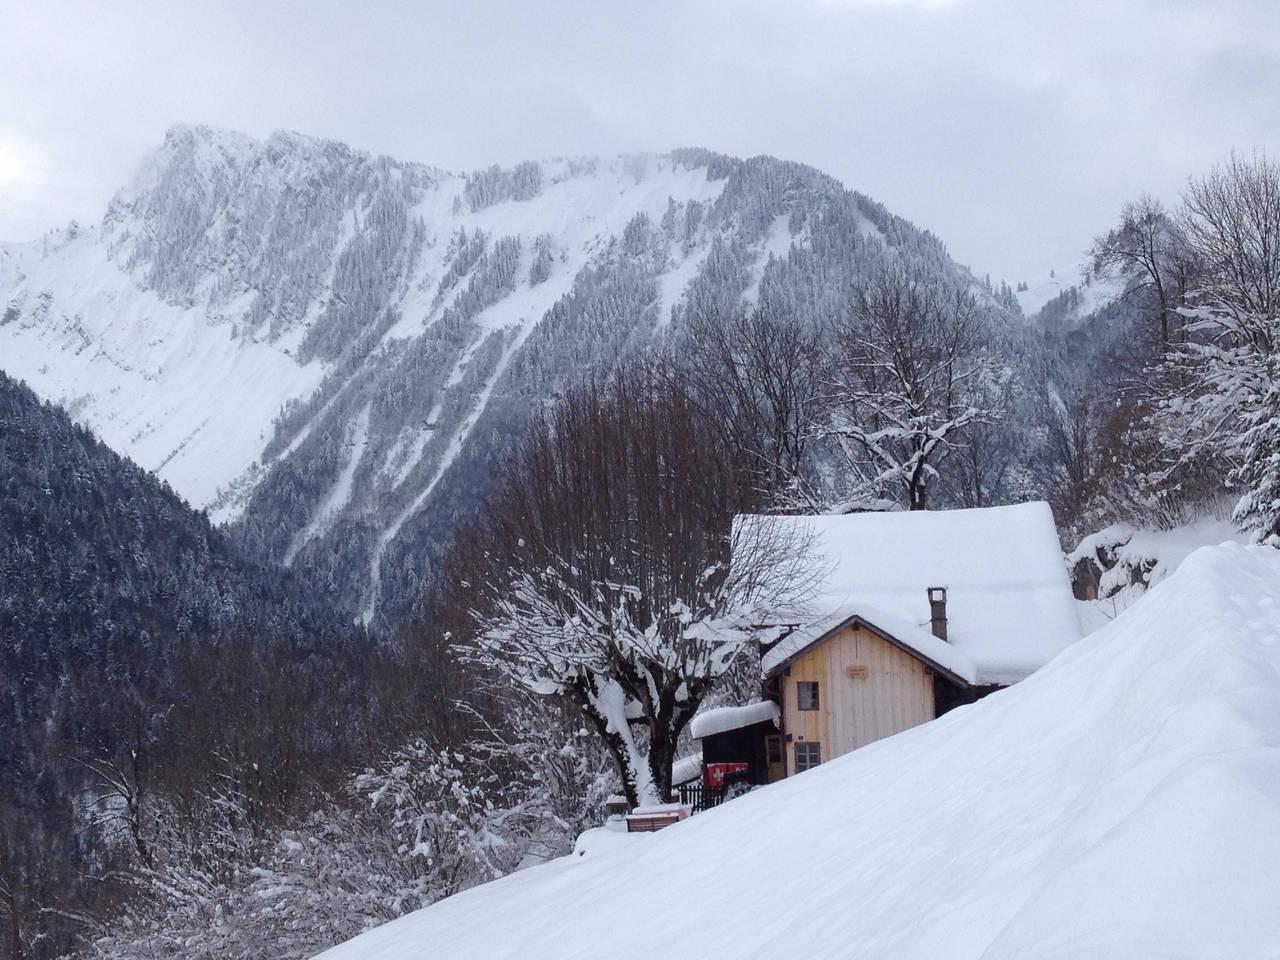 Apartment Heidi Chalet Alps - Unique Experience photo 28306522